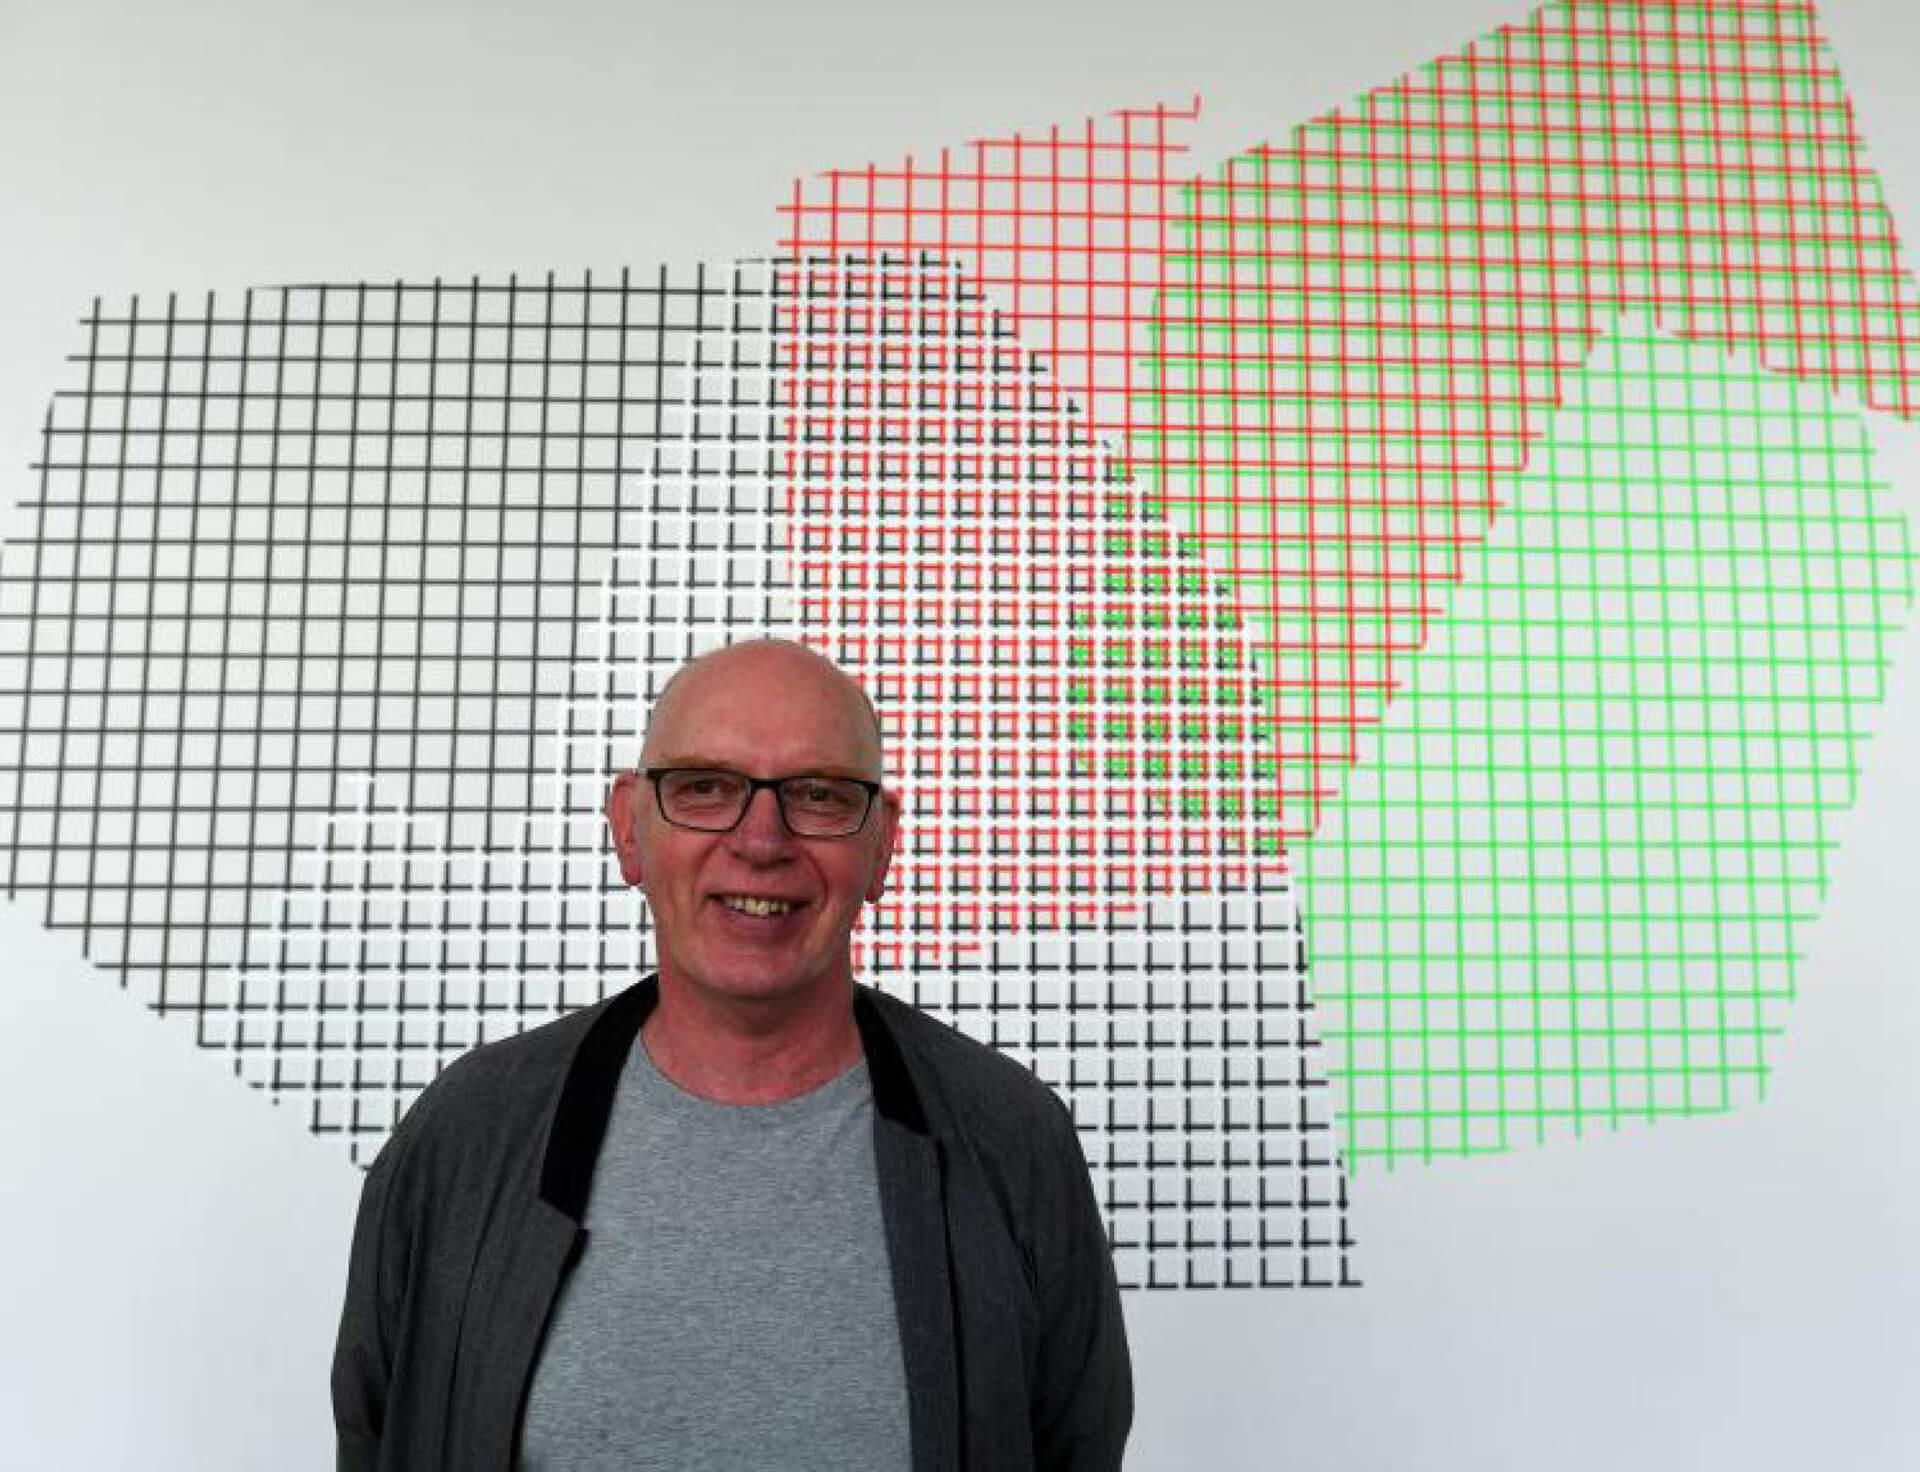 Richard Deacon receives the Heilbronner Vogelmann Prize